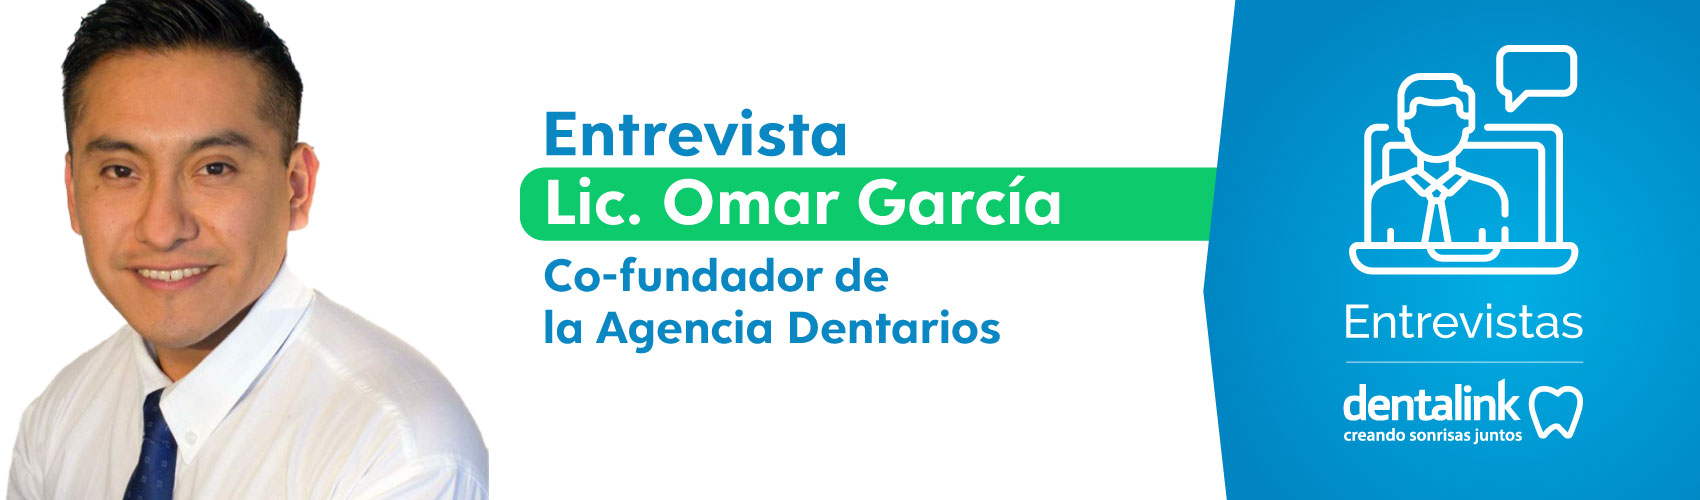 Entrevista con Lic. Omar García - Agencia Dentarios